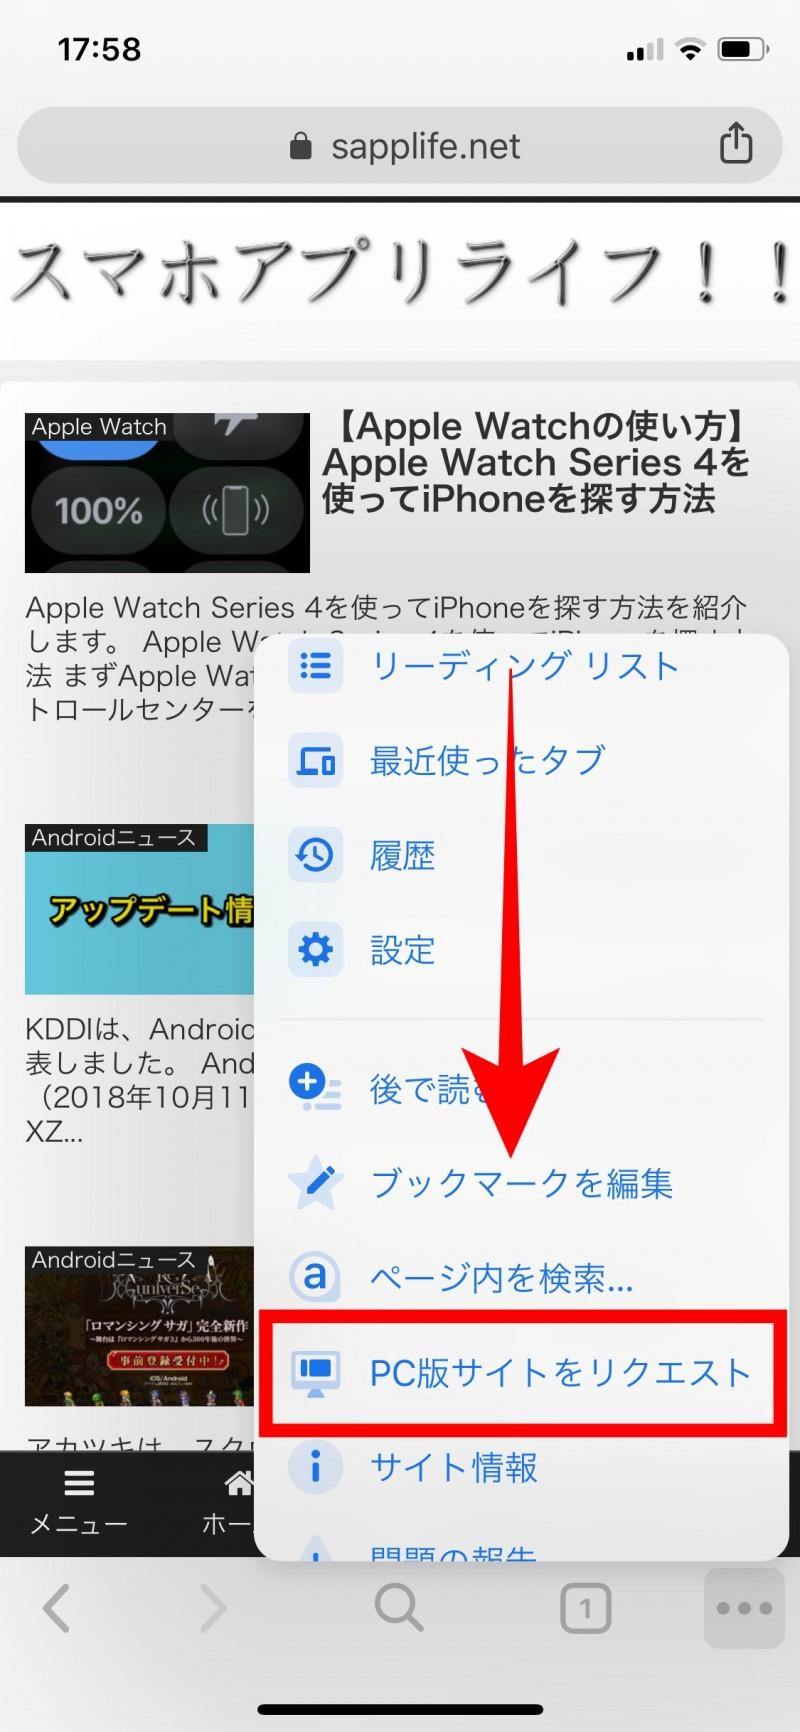 iPhoneでPC表示に切り替える